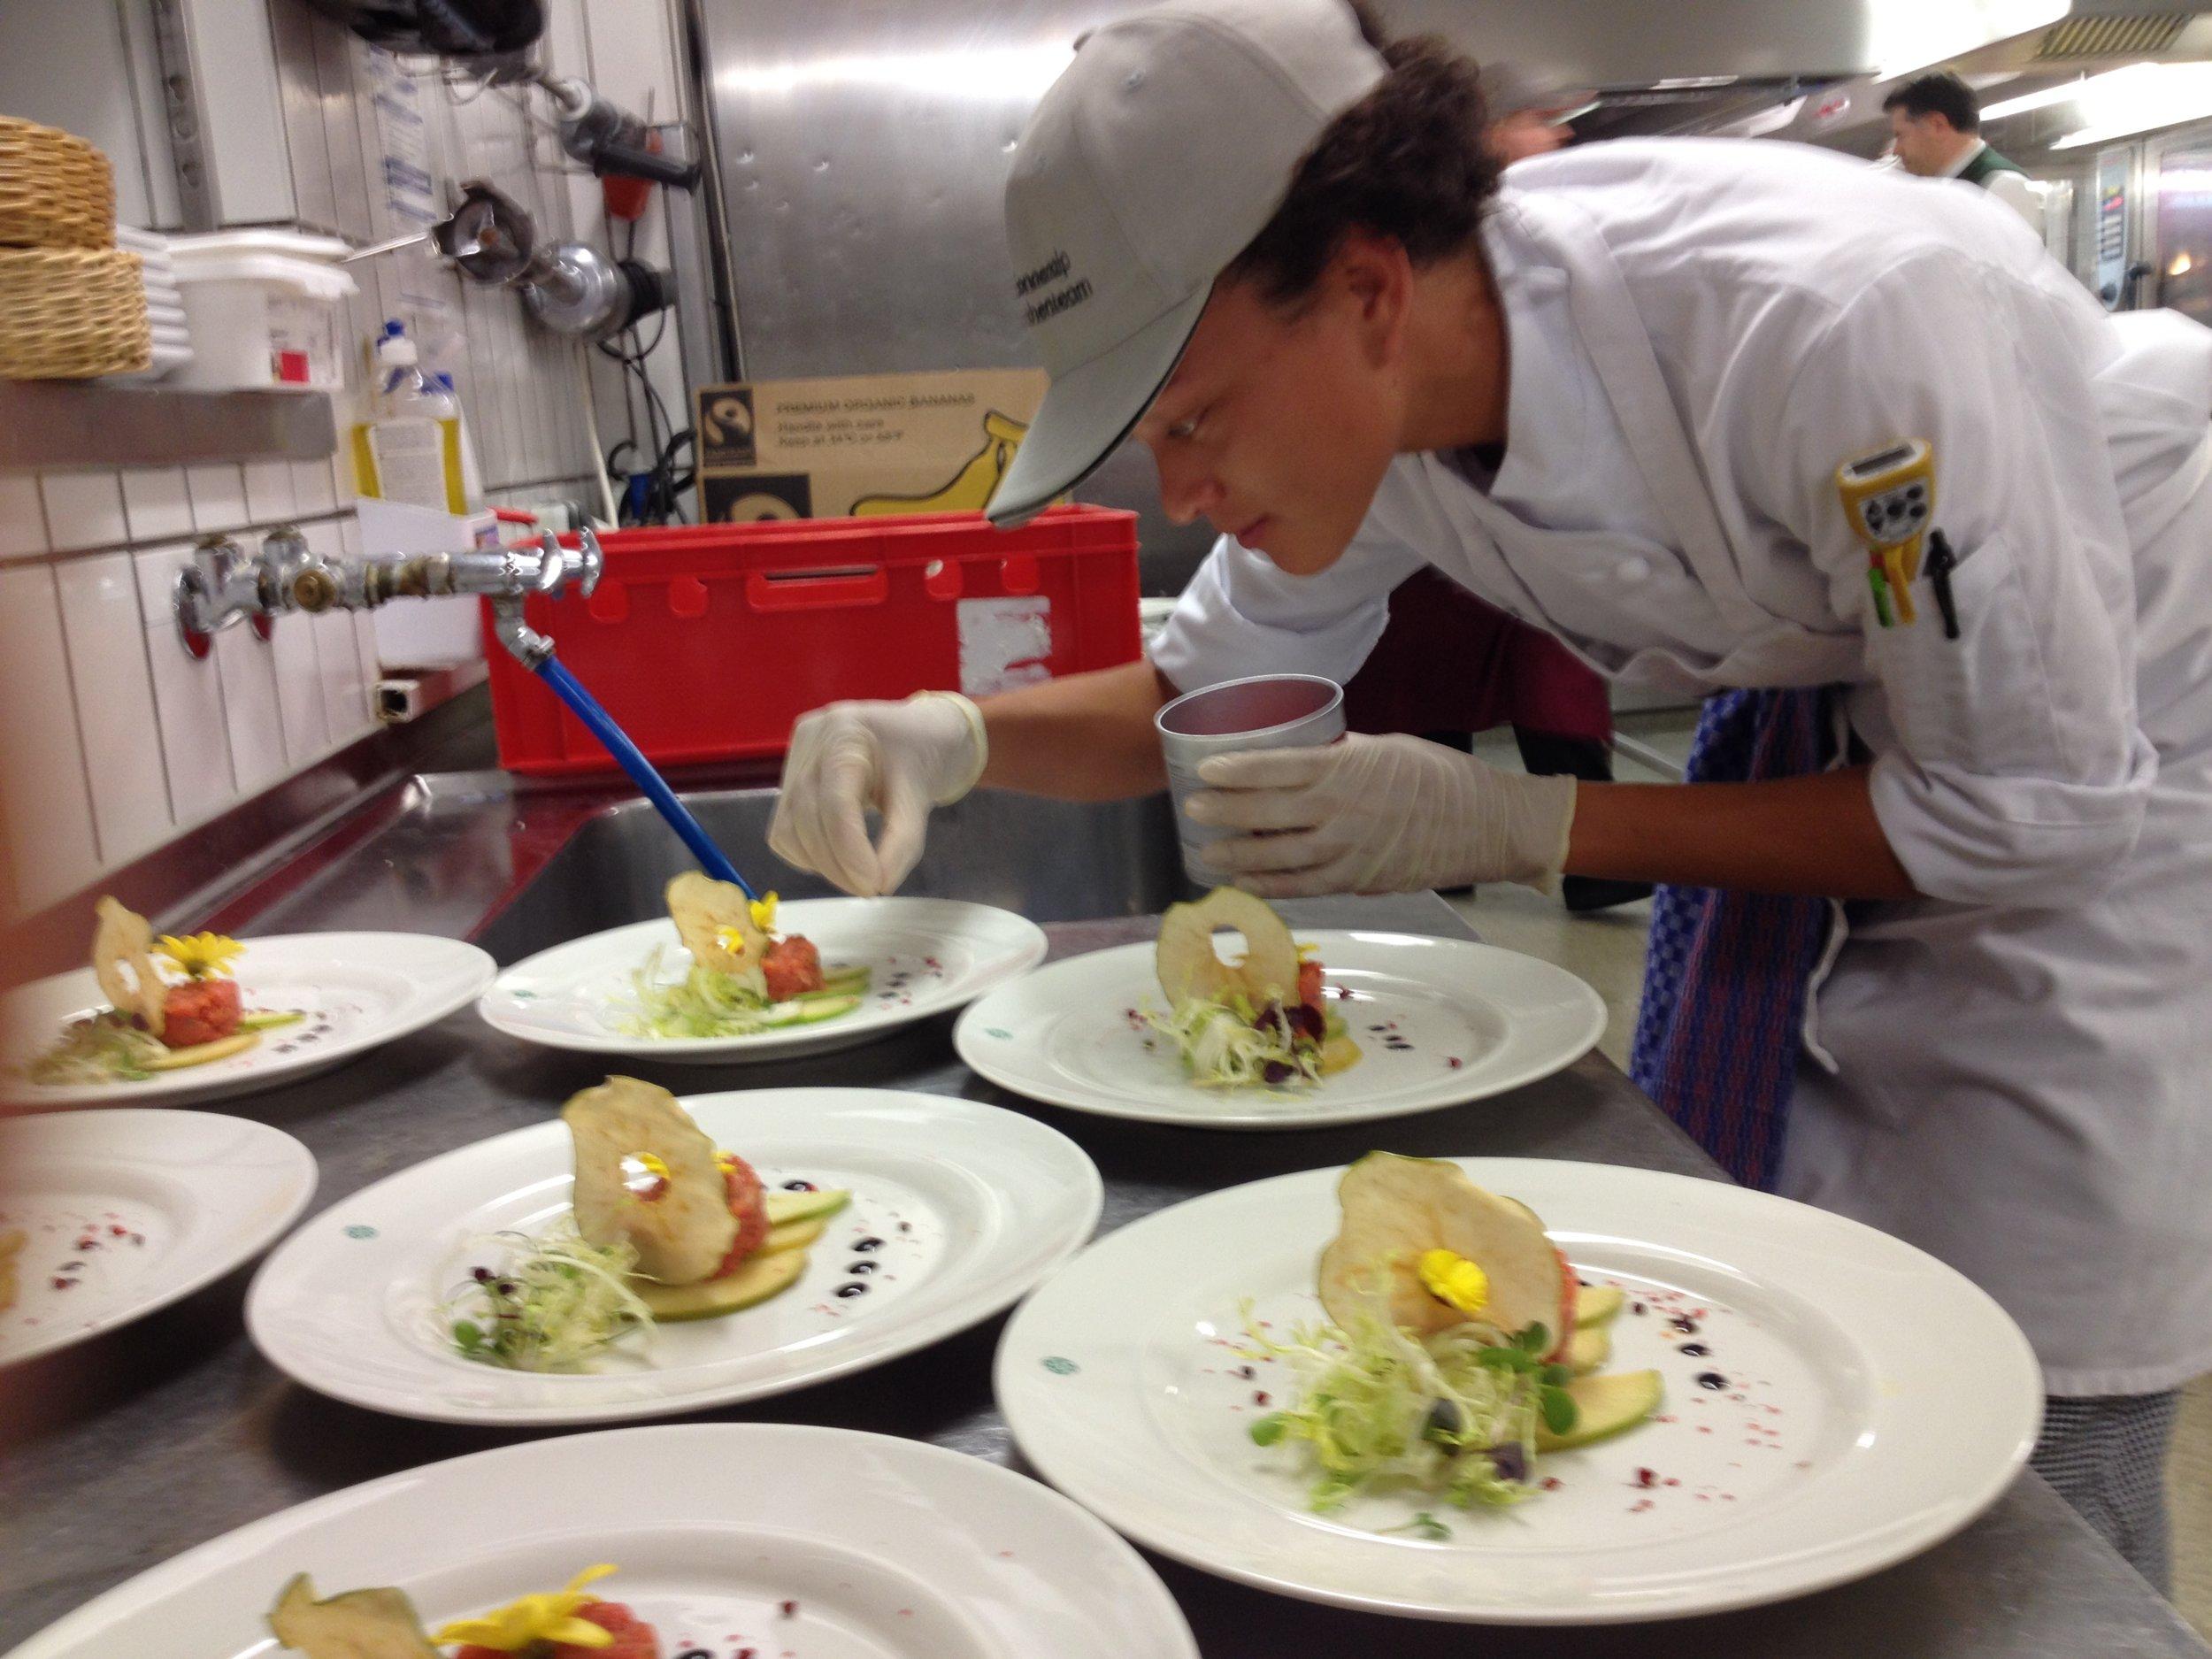 JWU student interns plates gourmet meal.